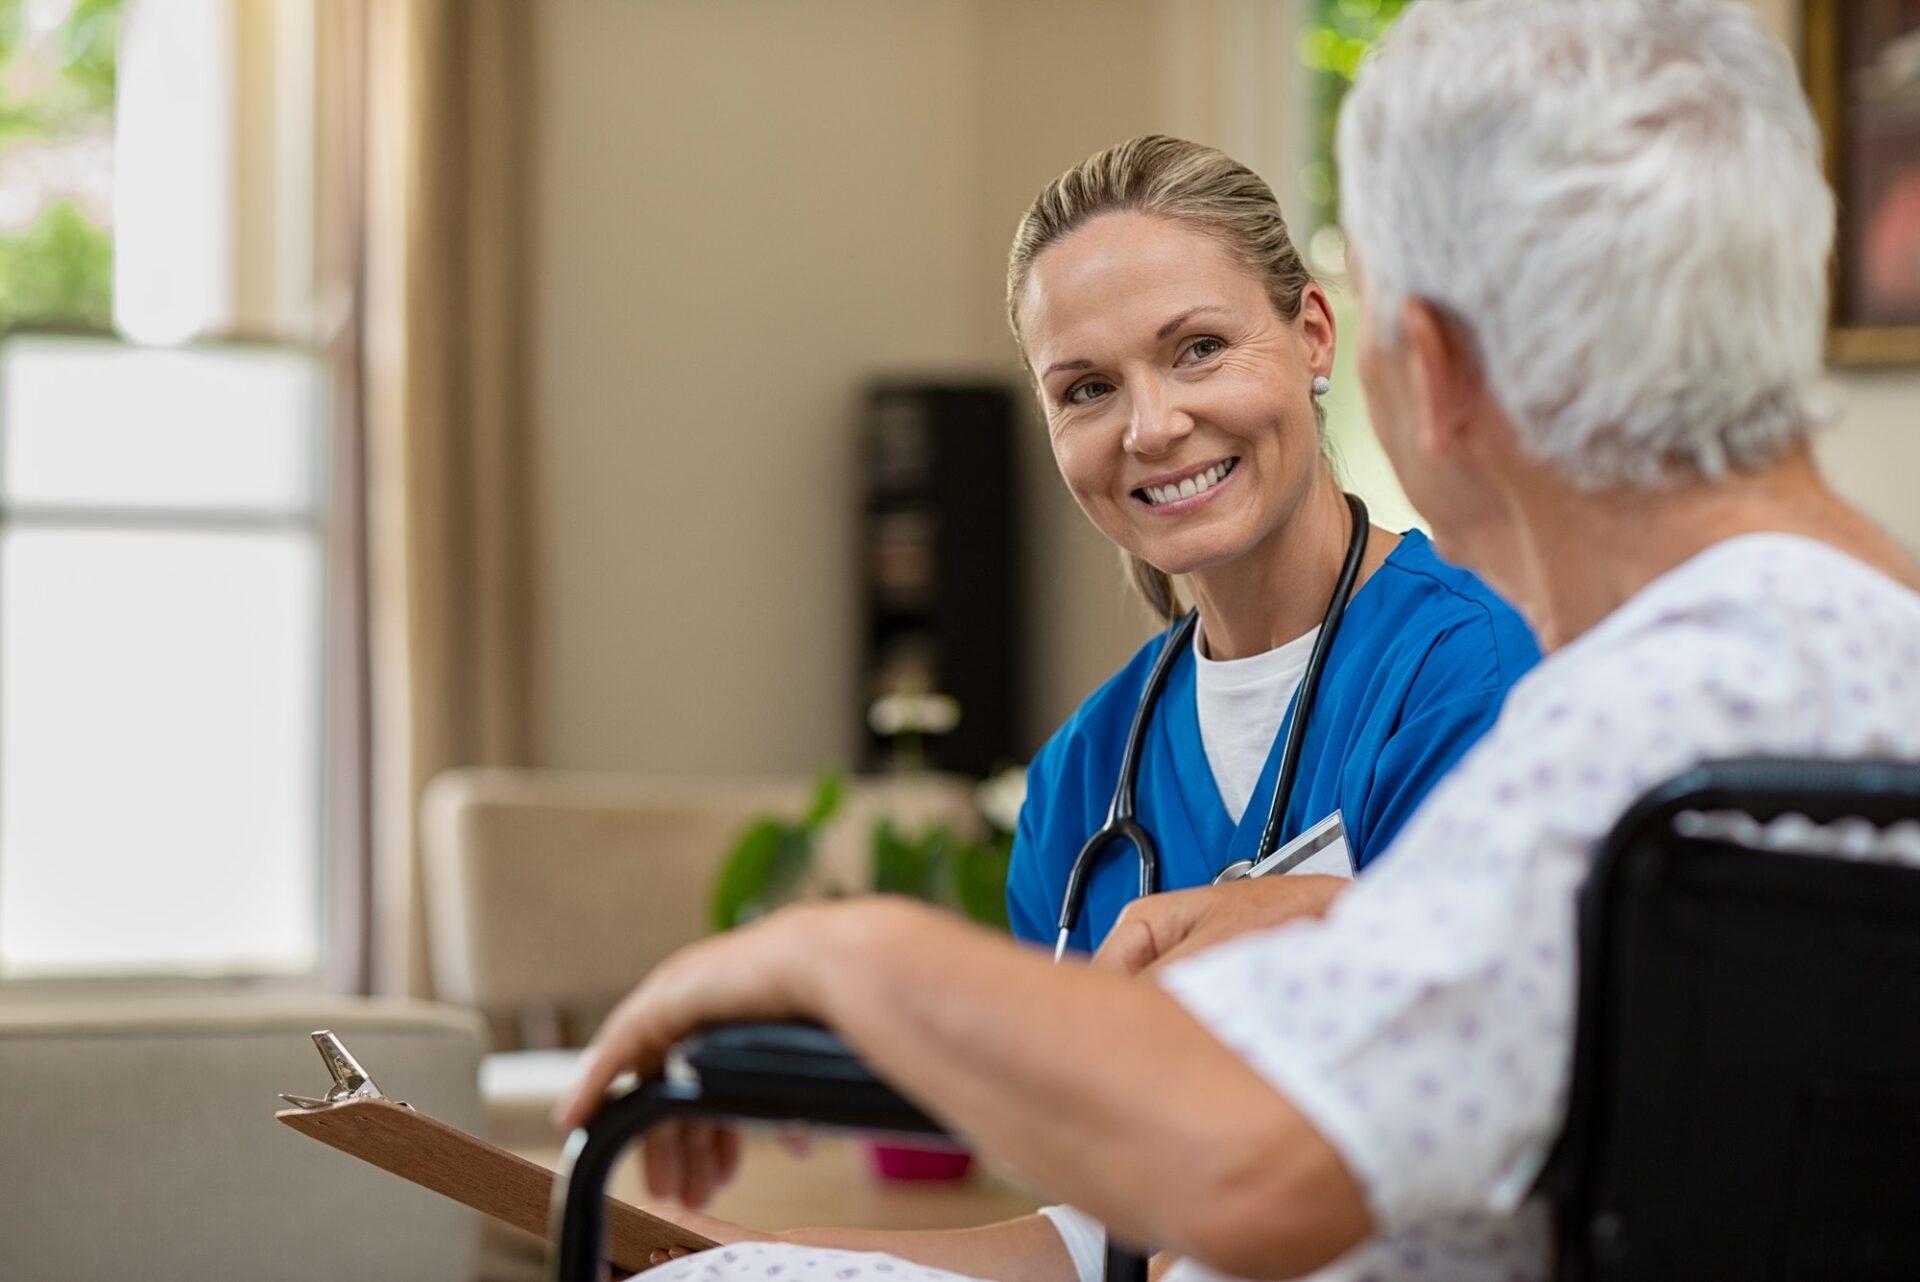 Friendly nurse talking to senior patient